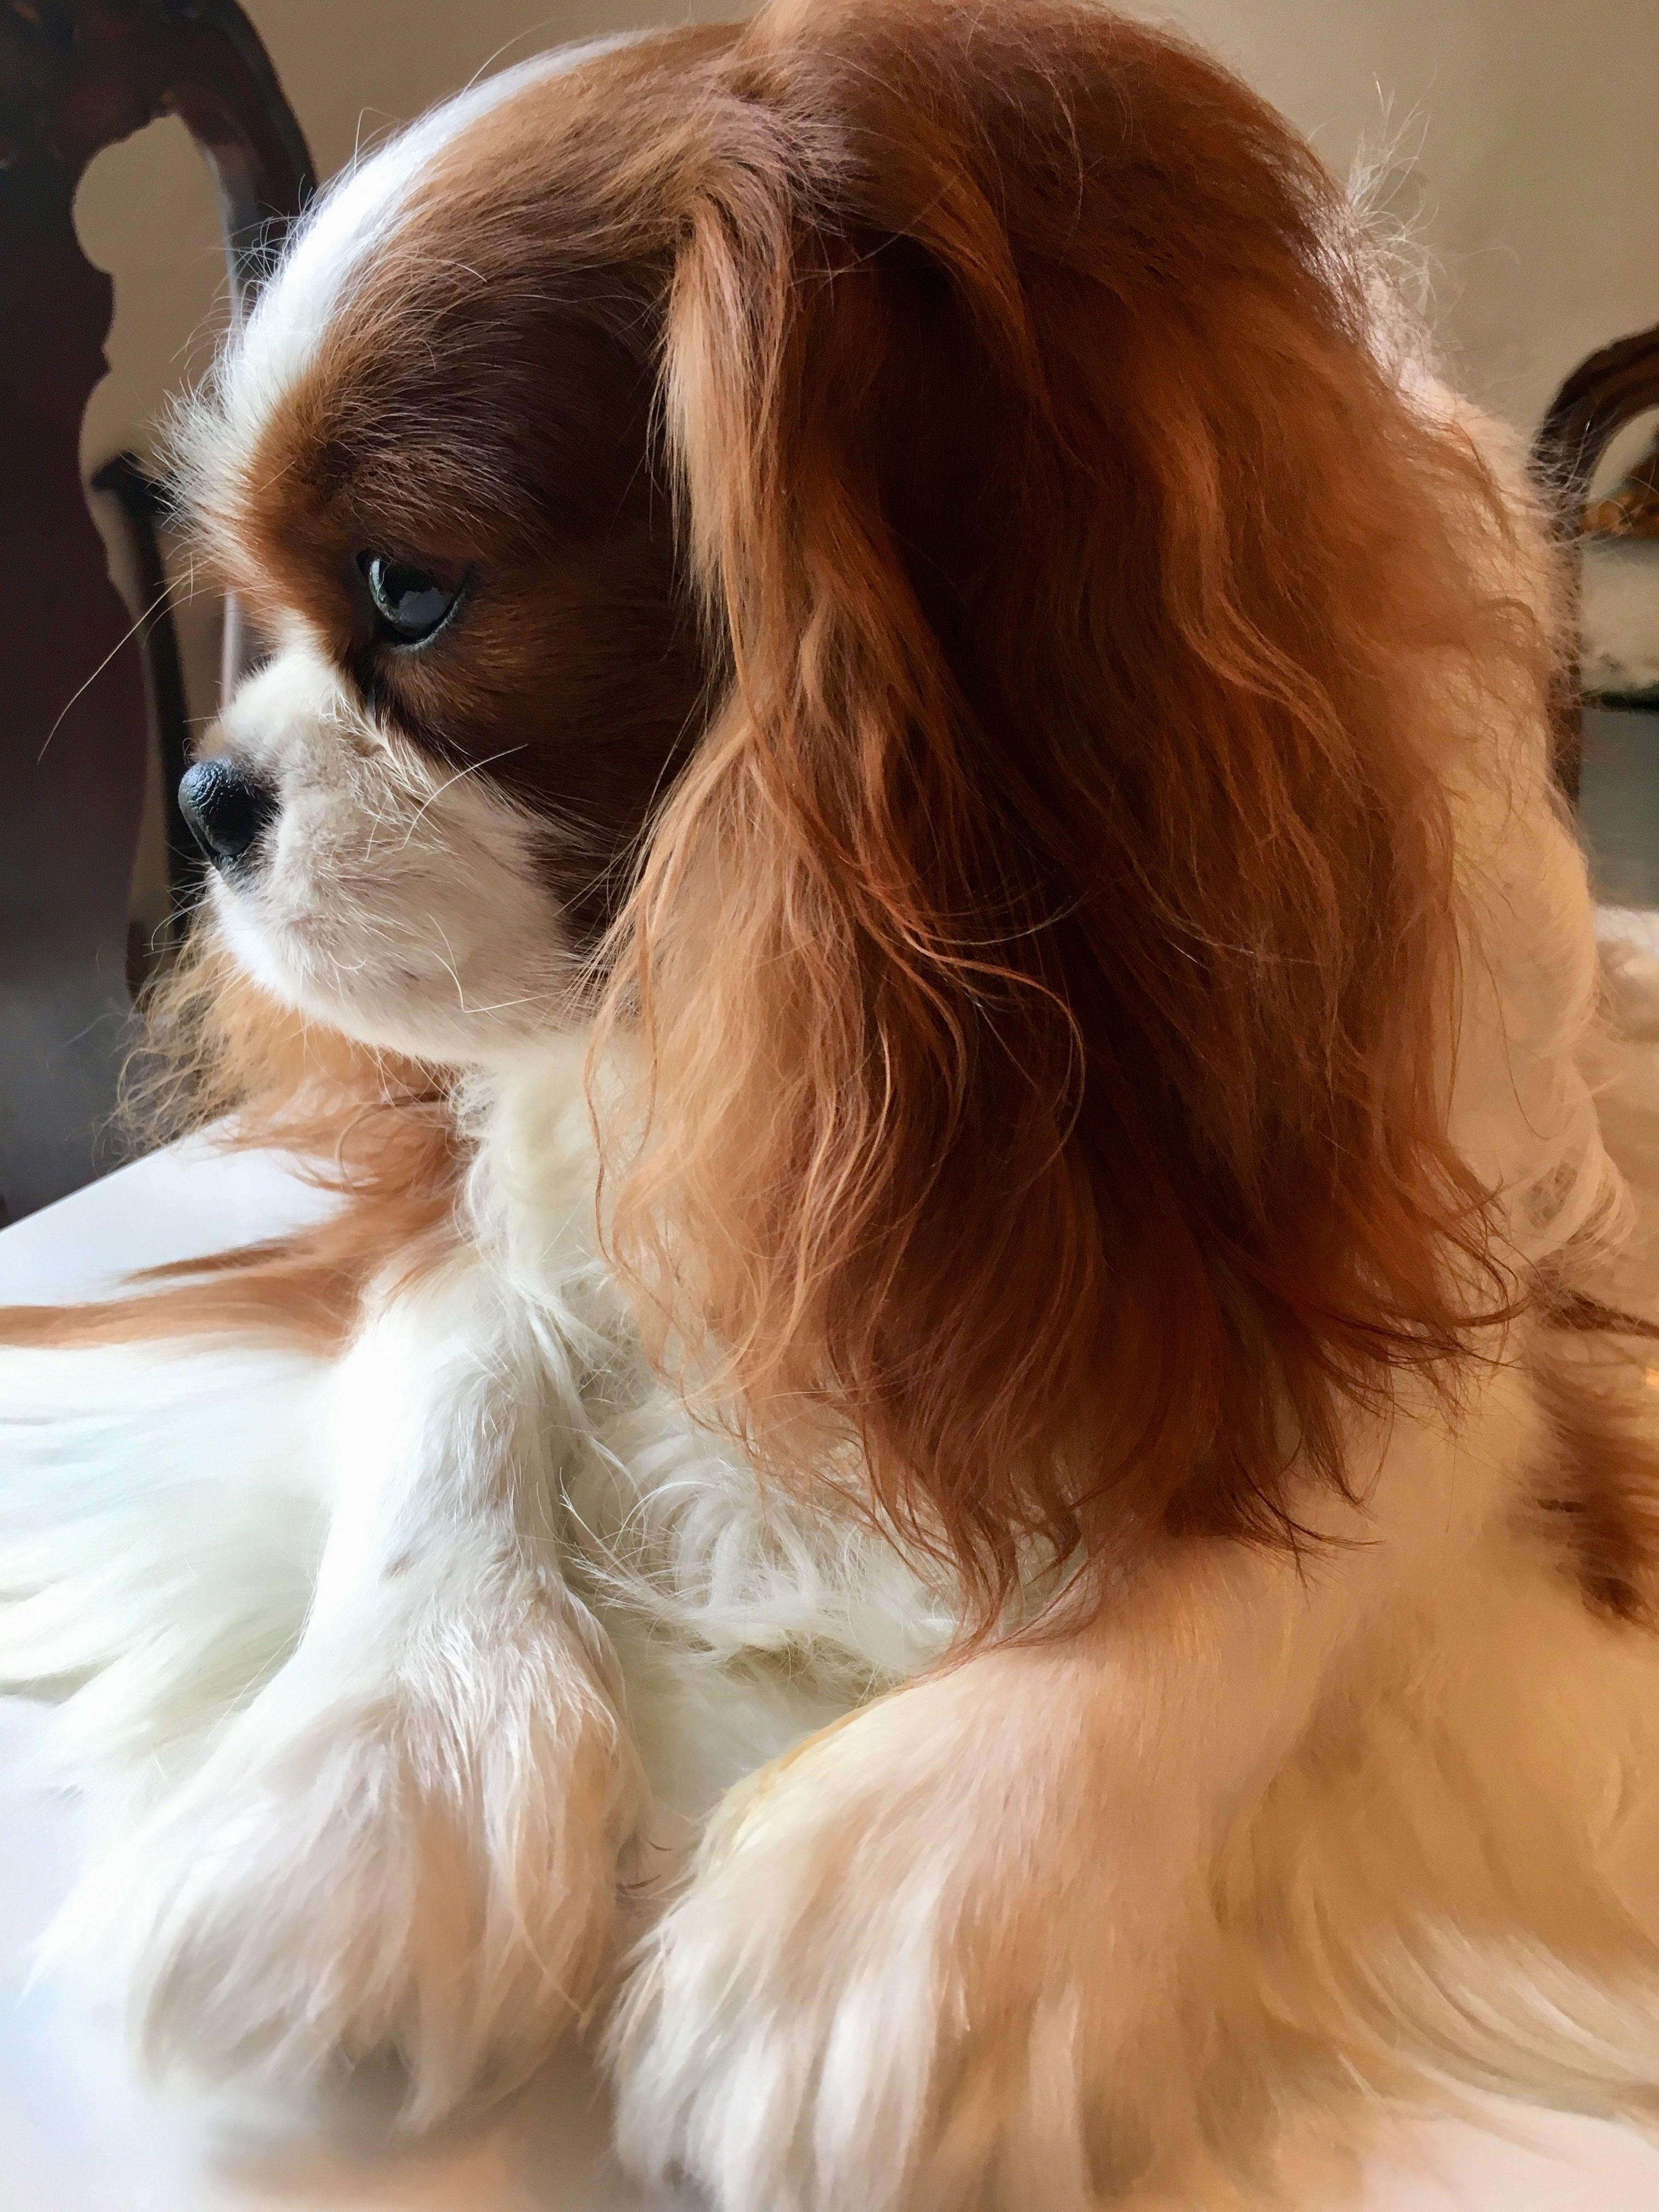 Pinterest catherinesullivan2017 King charles dog